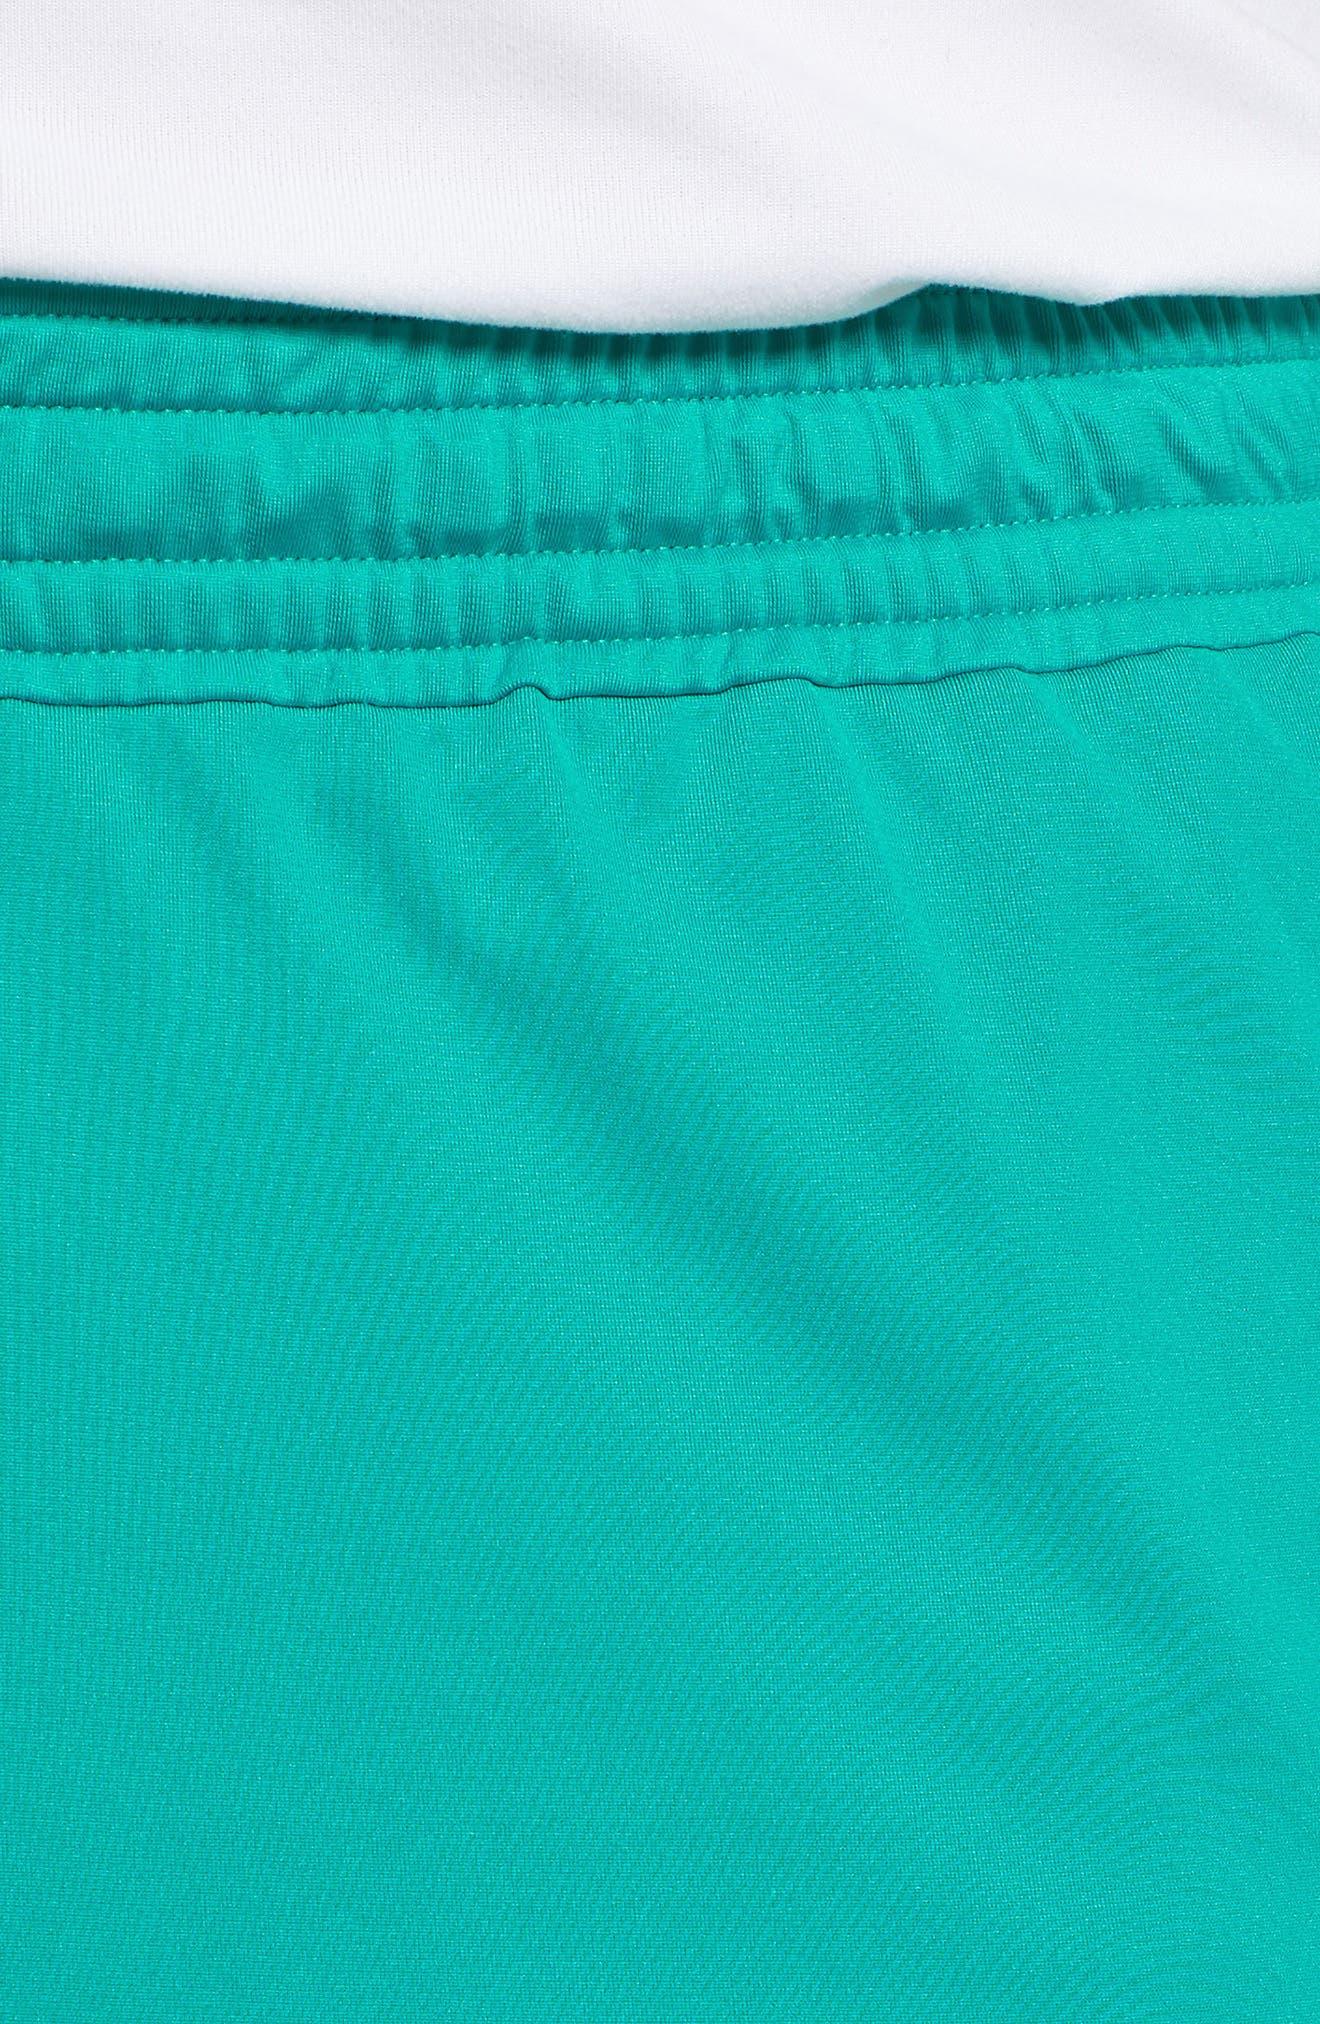 Mk1 Inset Fade Shorts,                             Alternate thumbnail 4, color,                             SWALLOWTAIL / TIDE / GREY